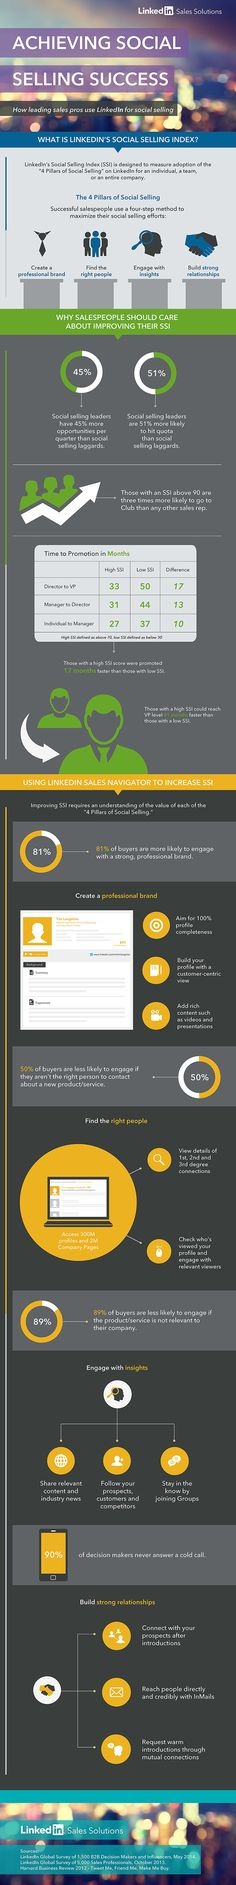 #SocialSelling with #LinkedIn